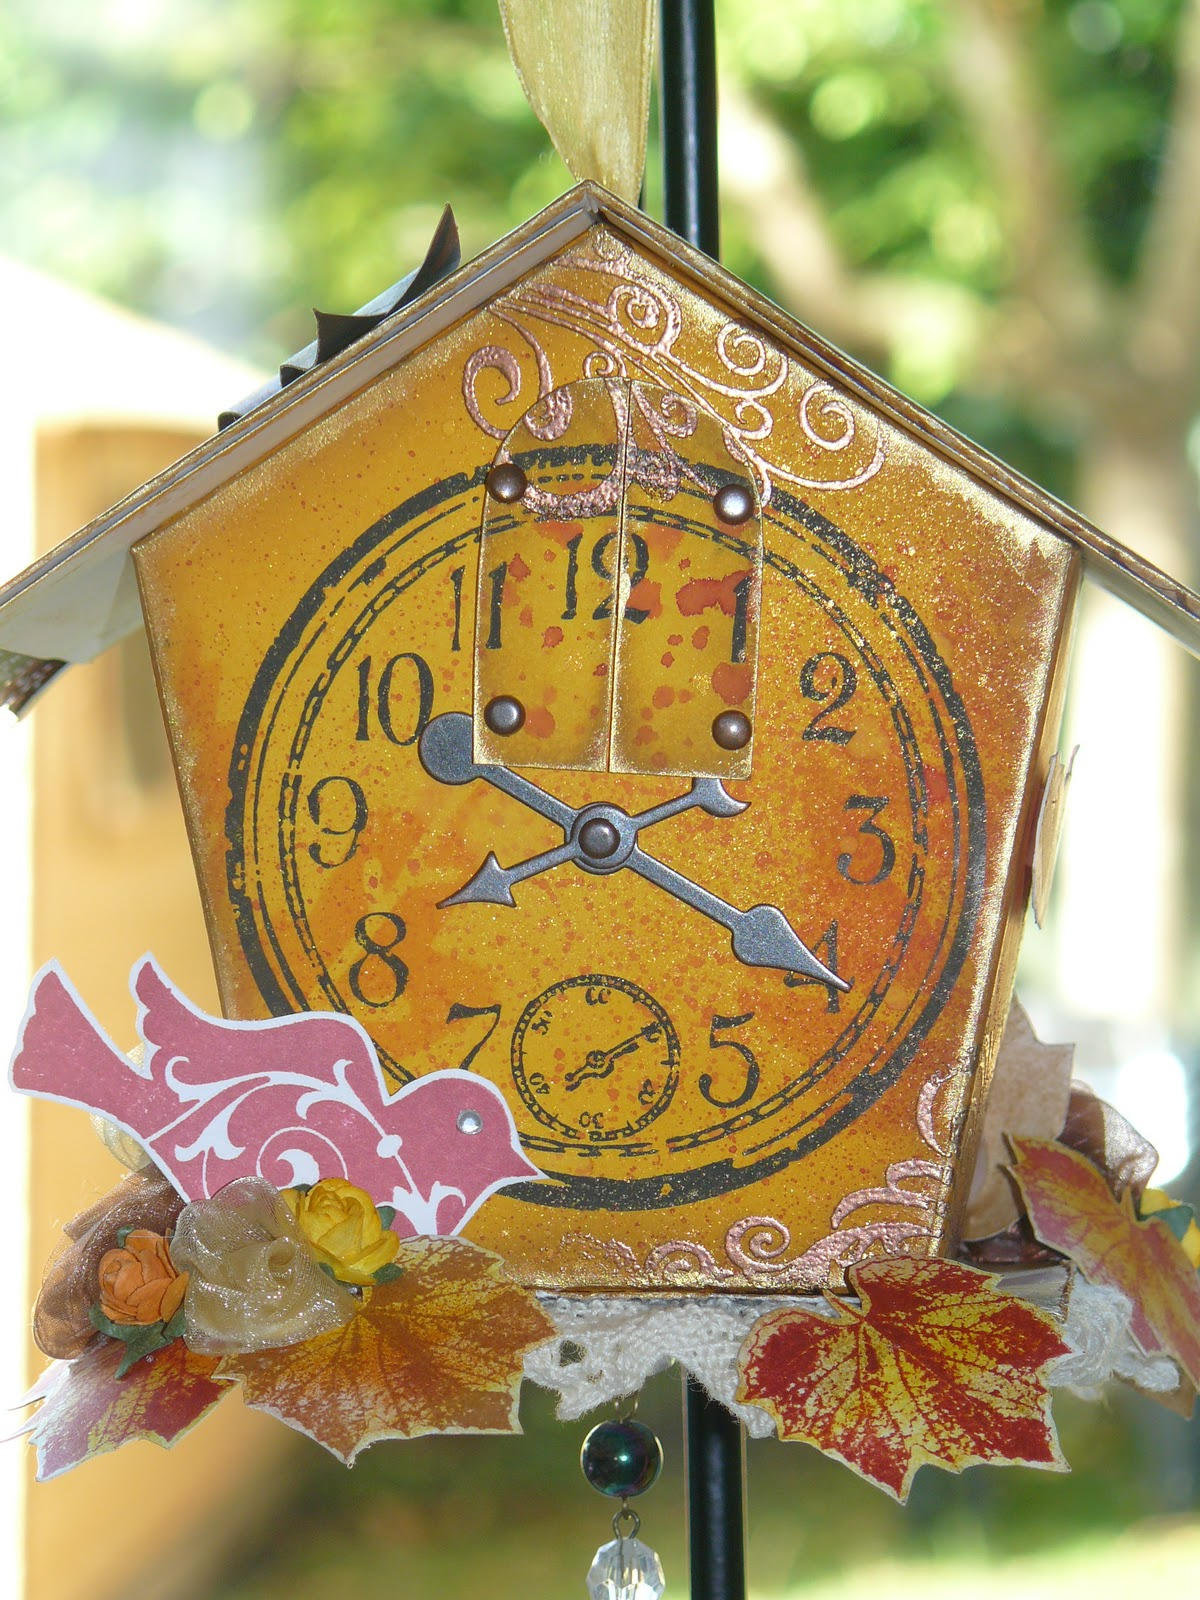 Sentimental Sundays 23 Time Captured In Autumnal